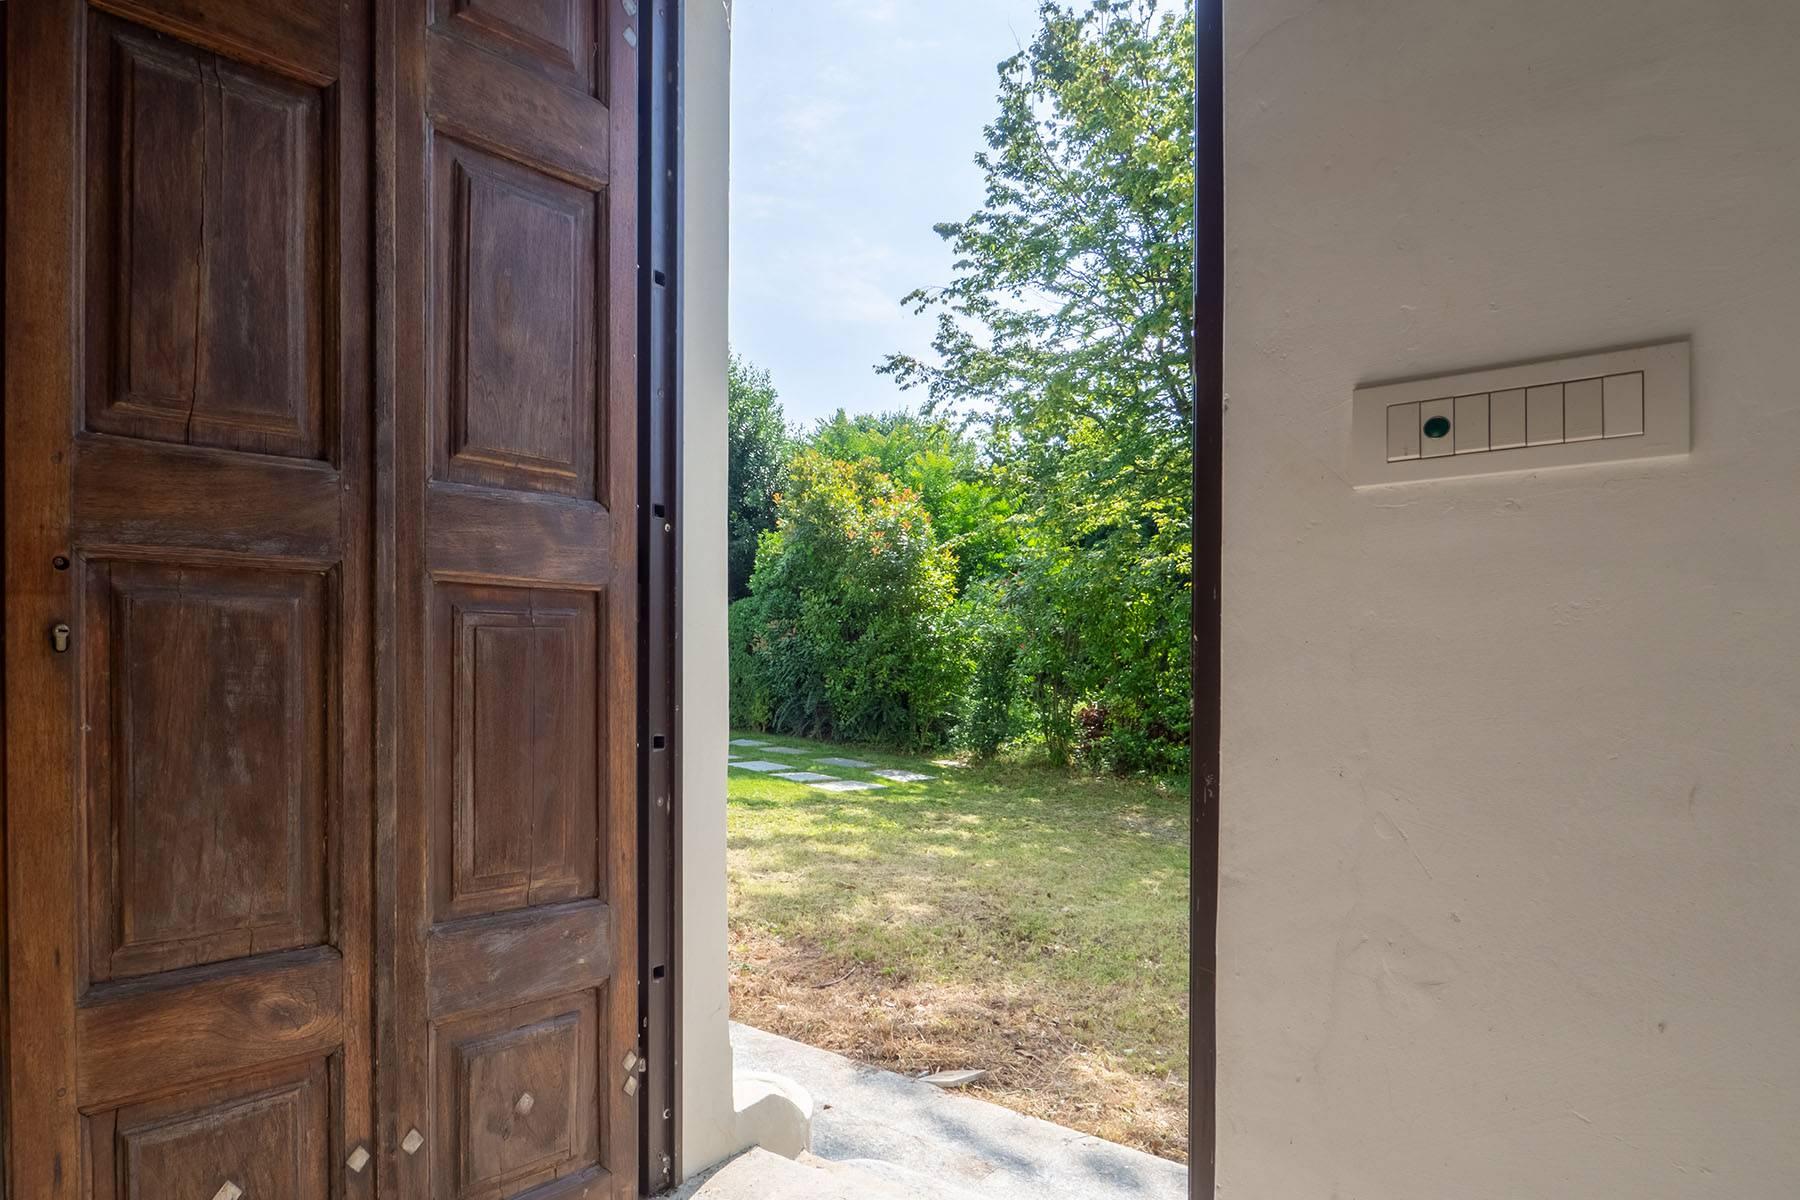 Casa indipendente in Vendita a Torino: 5 locali, 400 mq - Foto 16